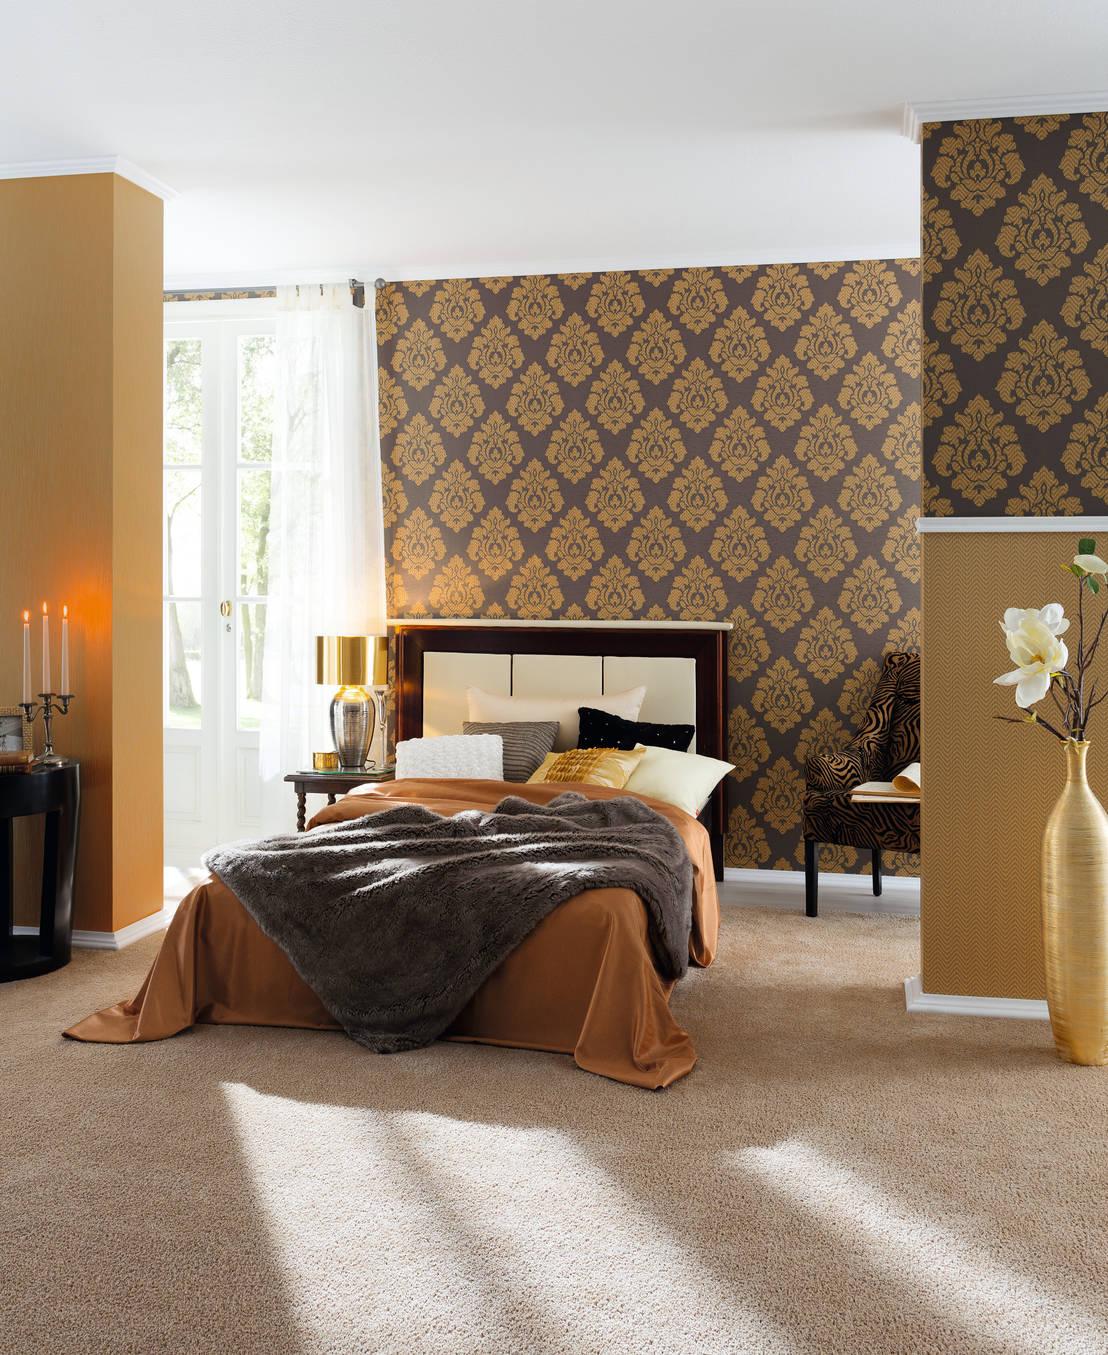 tapetenmax barocktapeten von tapetenmax kr ger gmbh homify. Black Bedroom Furniture Sets. Home Design Ideas